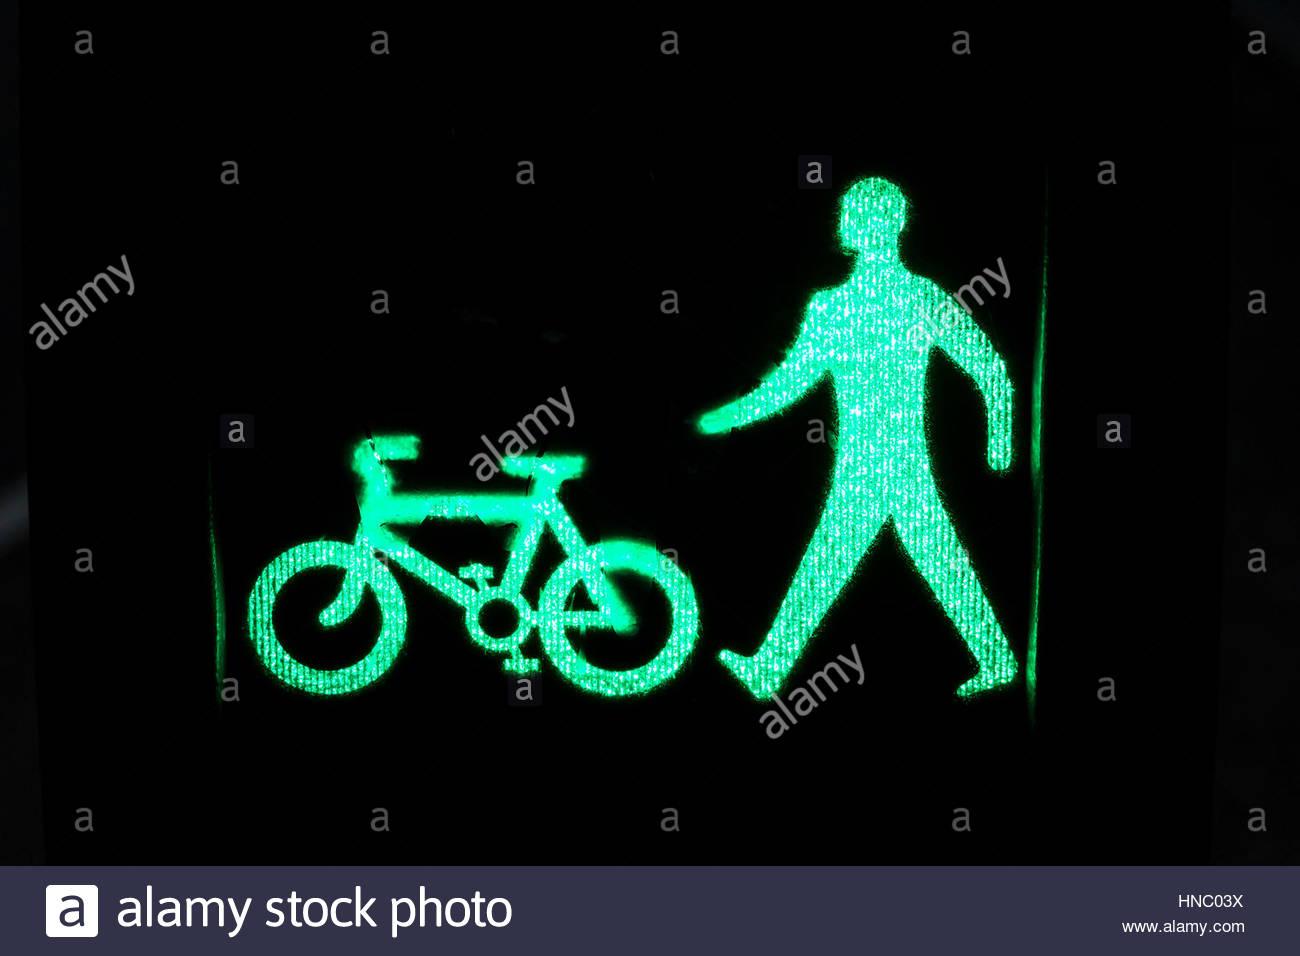 Illustrated pedestrian signal at crosswalk in Glasgow. - Stock Image